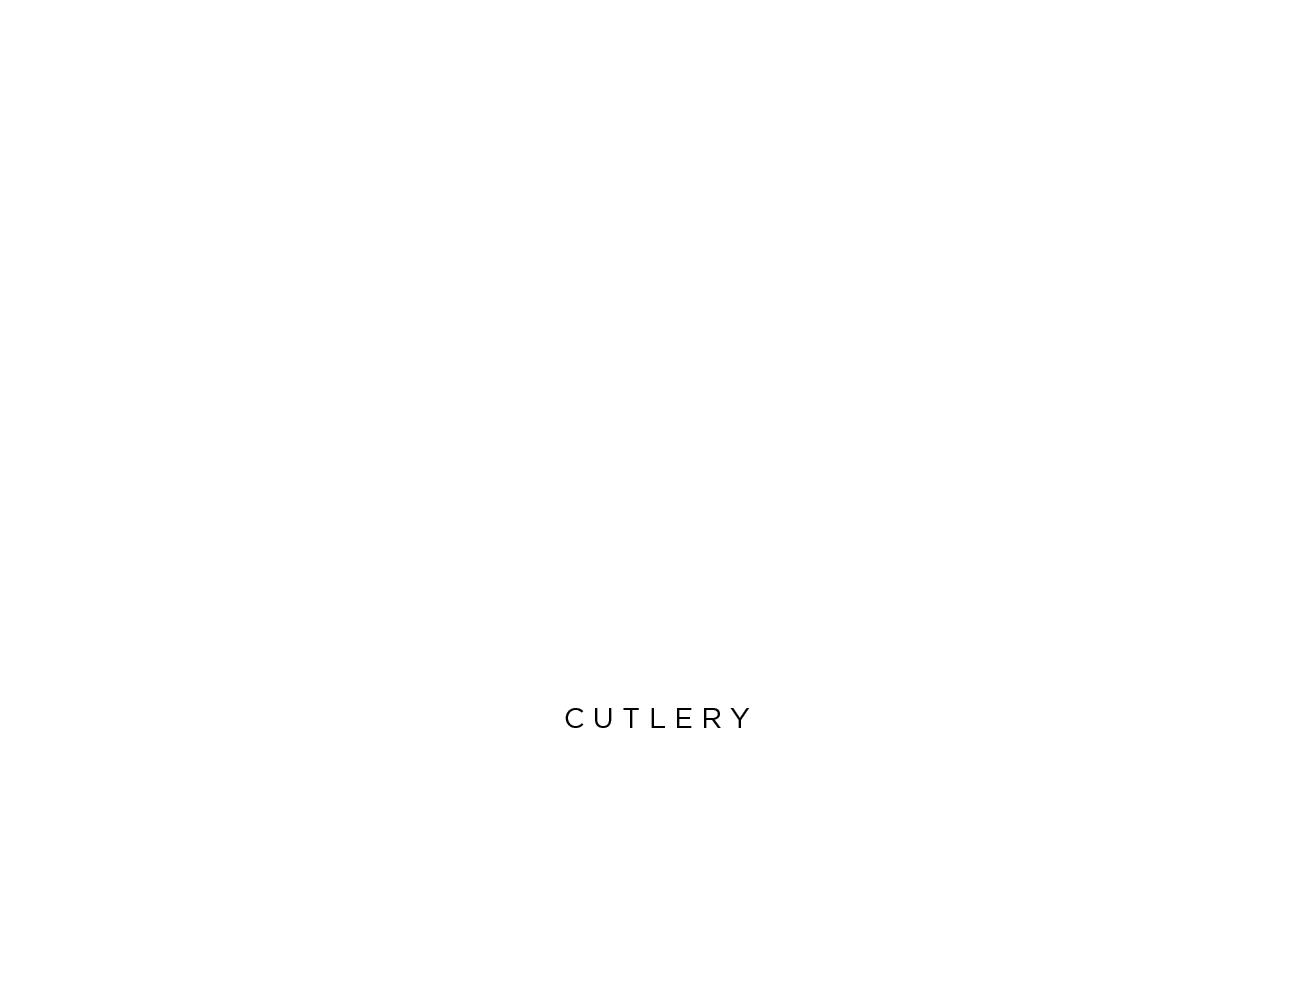 Cutlery ultimo